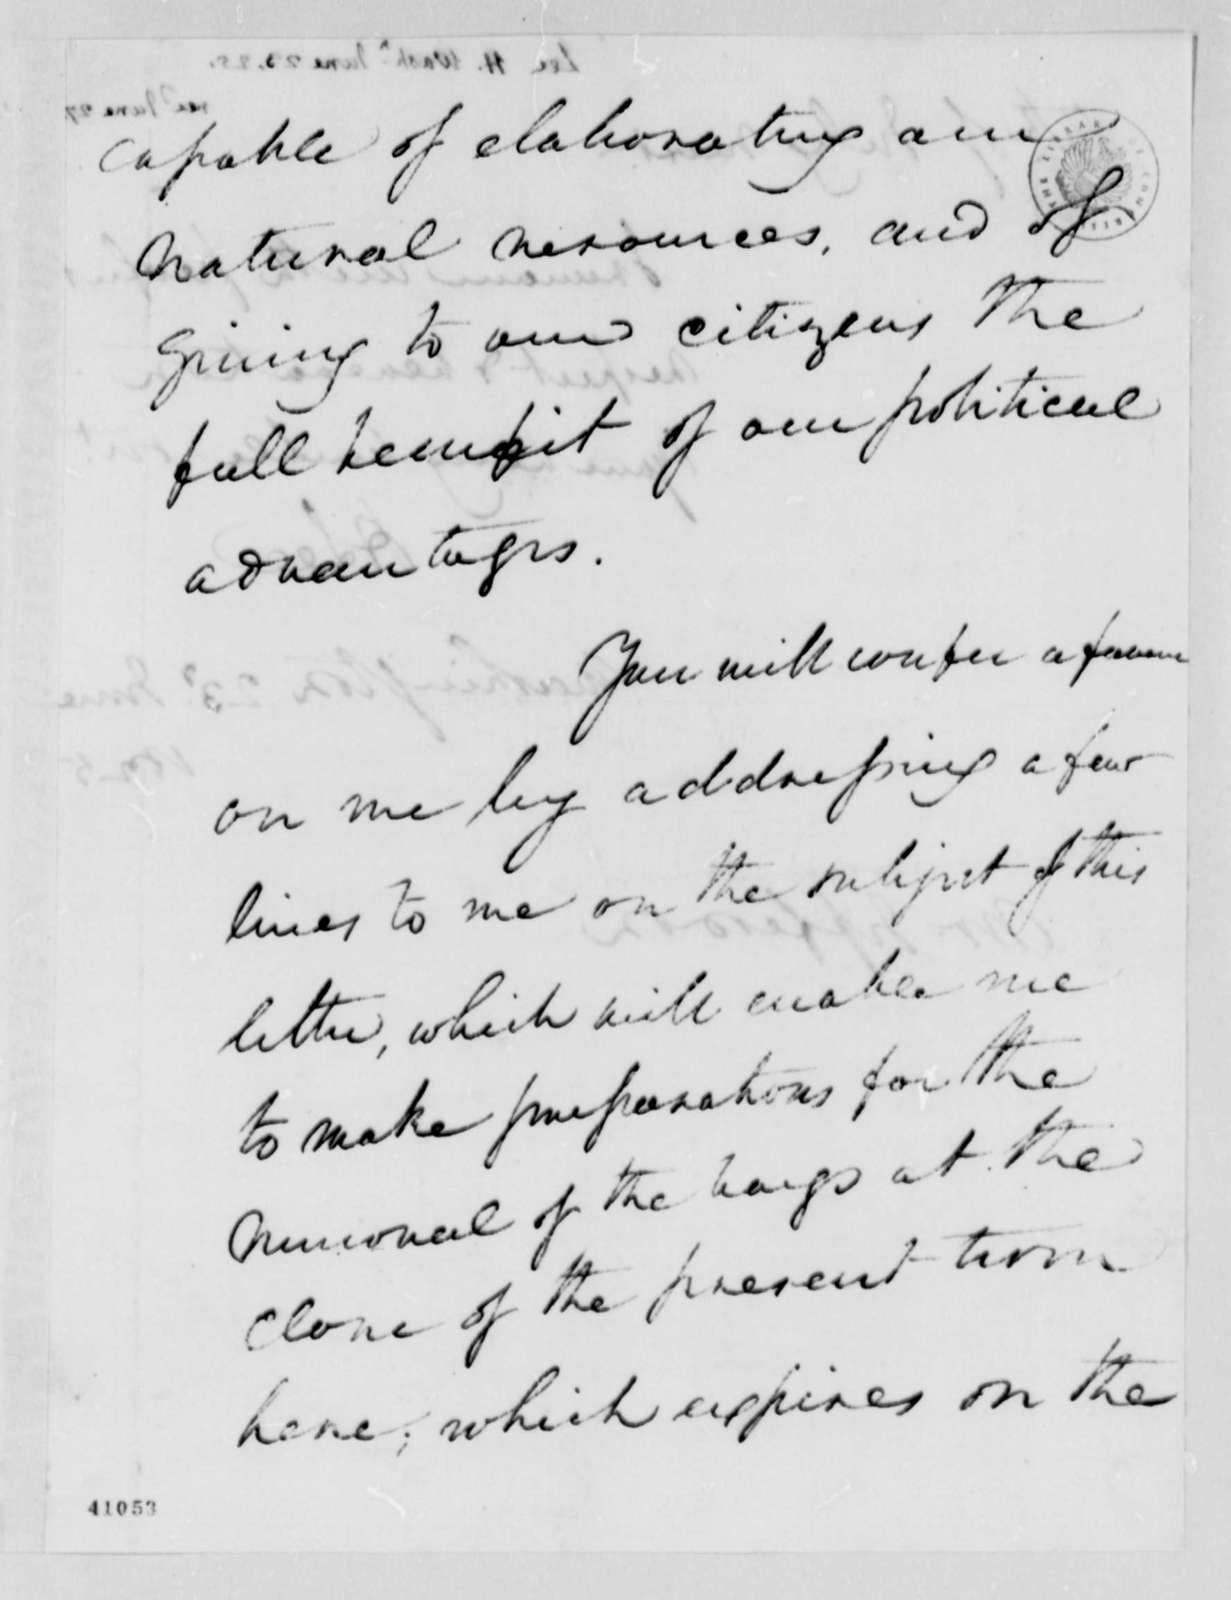 Henry Lee, Jr. to Thomas Jefferson, June 23, 1825